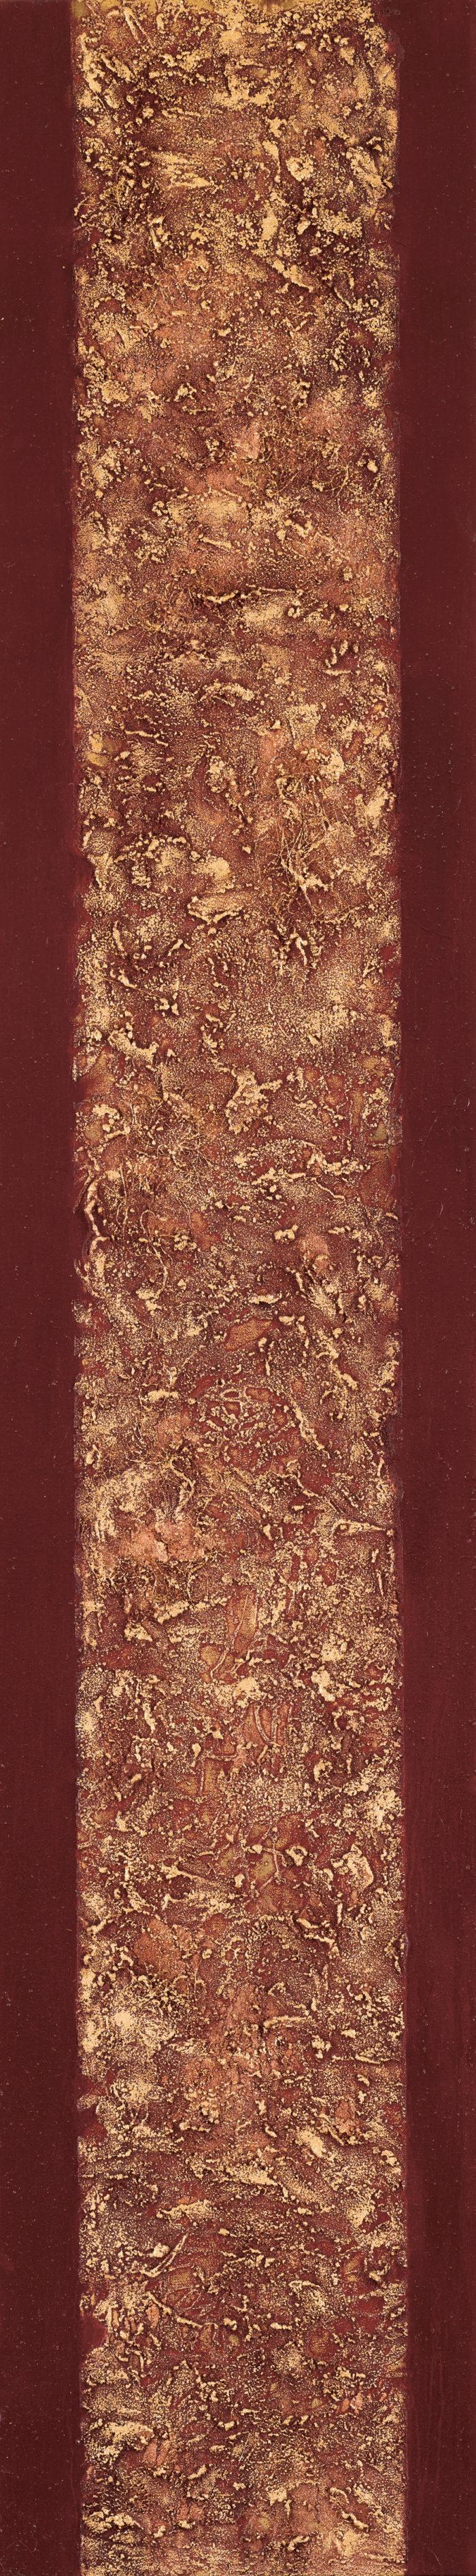 Heart Sutra D (2015) 162cm x 30cm